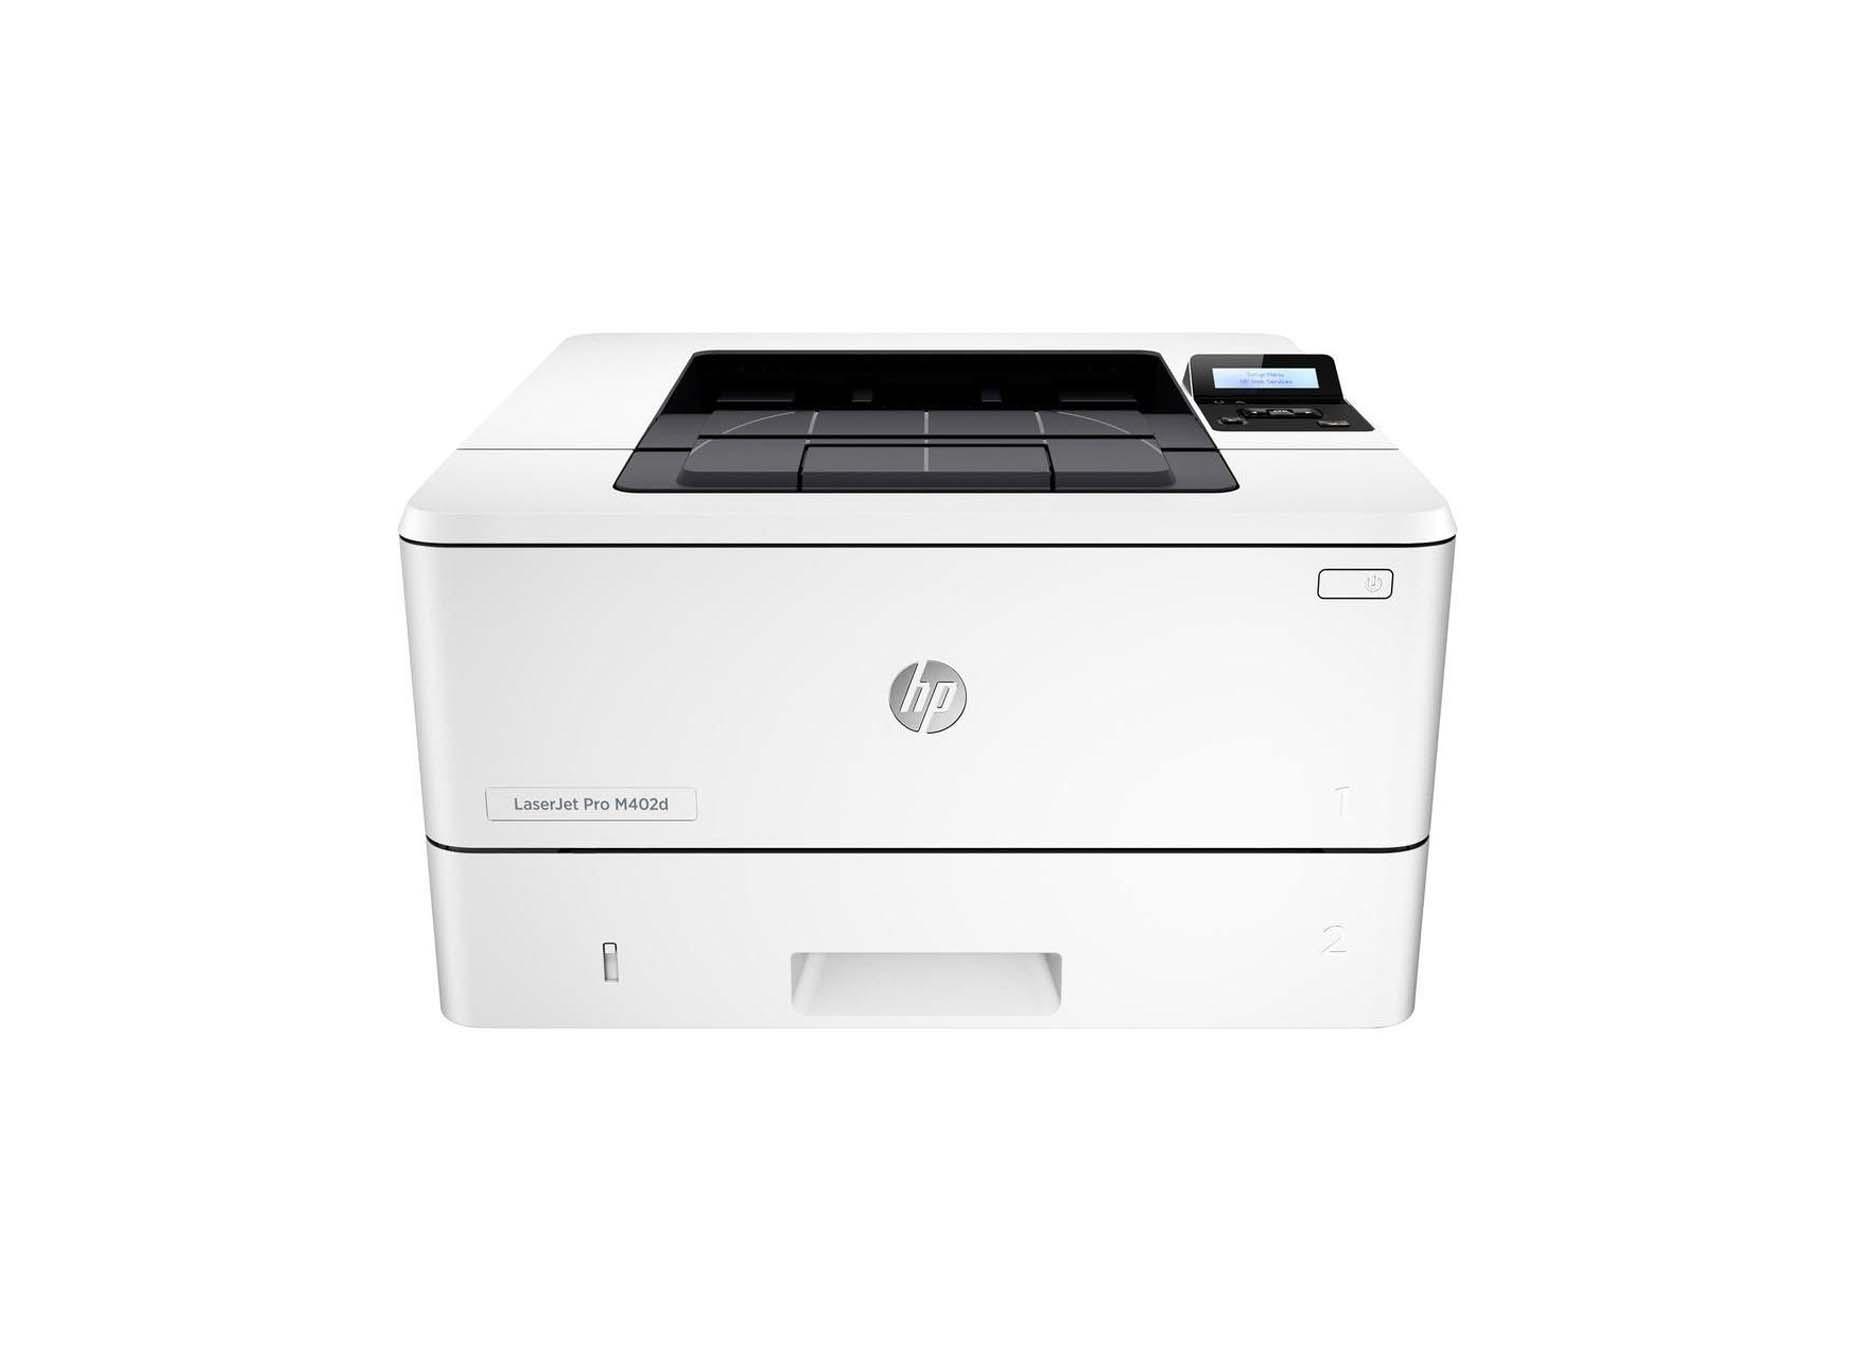 Harga HP LaserJet Pro M402dn [C5F94A]